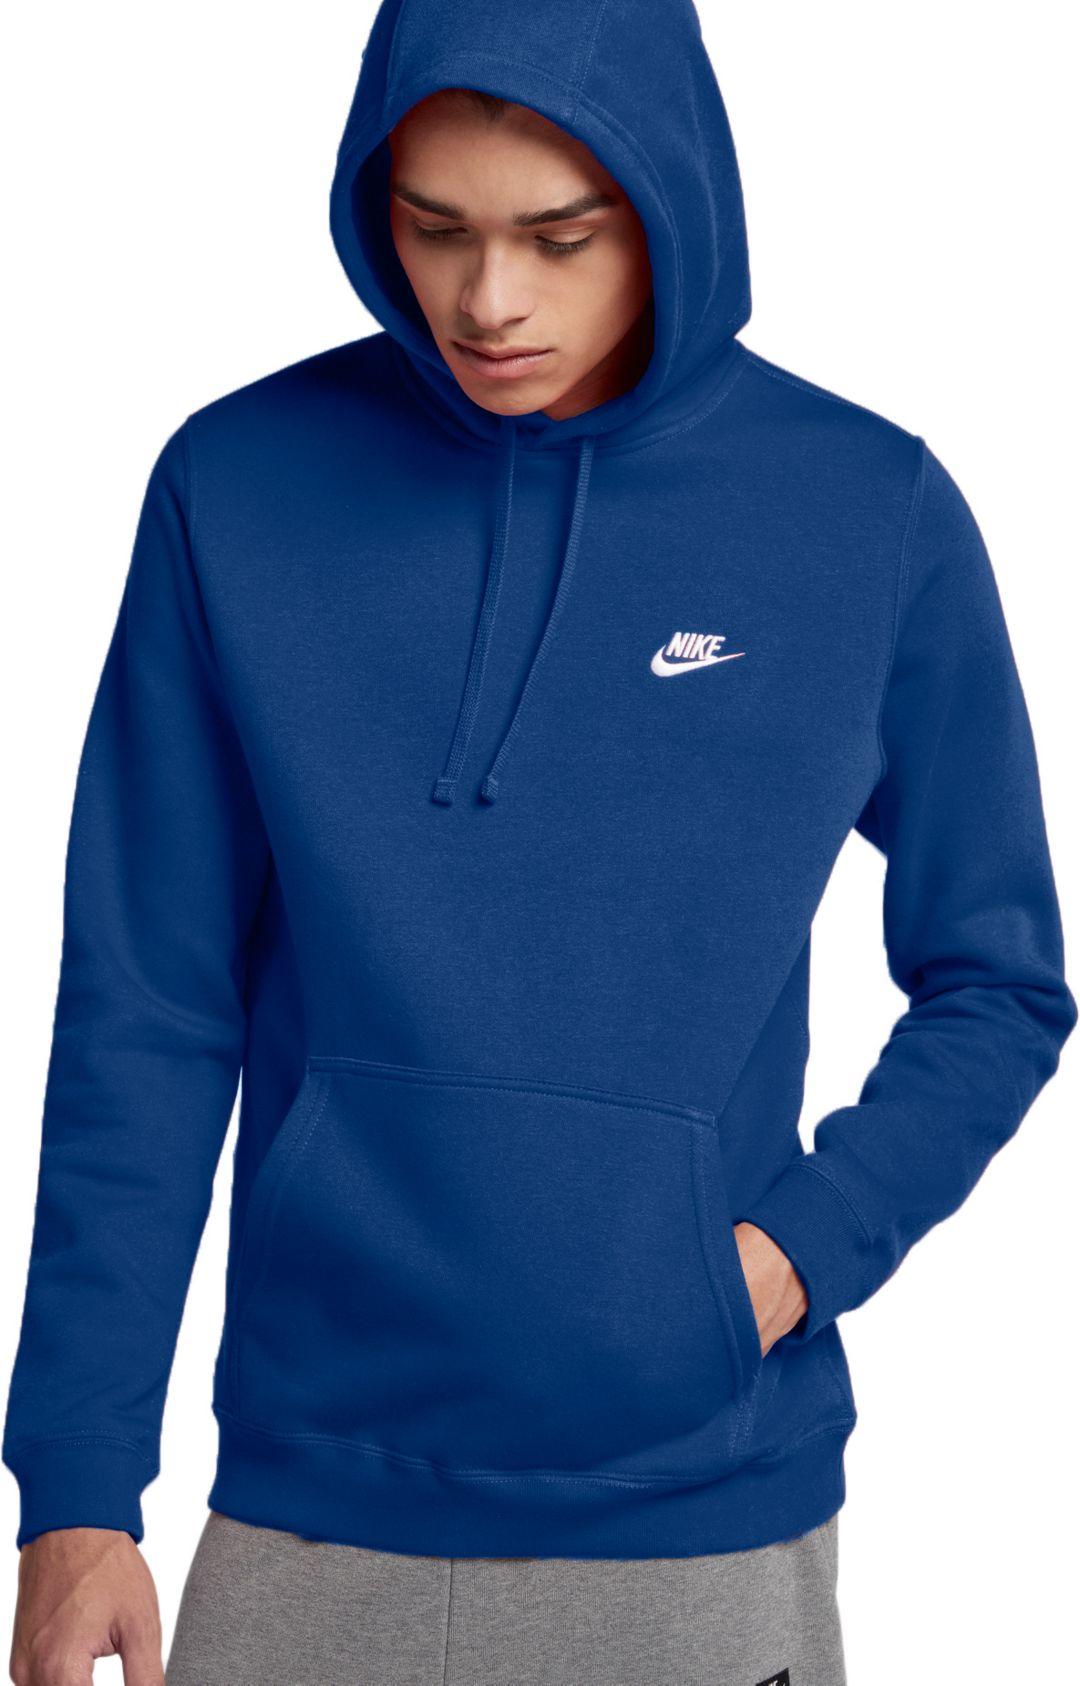 fa0a7bb6d Nike Men's Club Fleece Pullover Hoodie. noImageFound. Previous